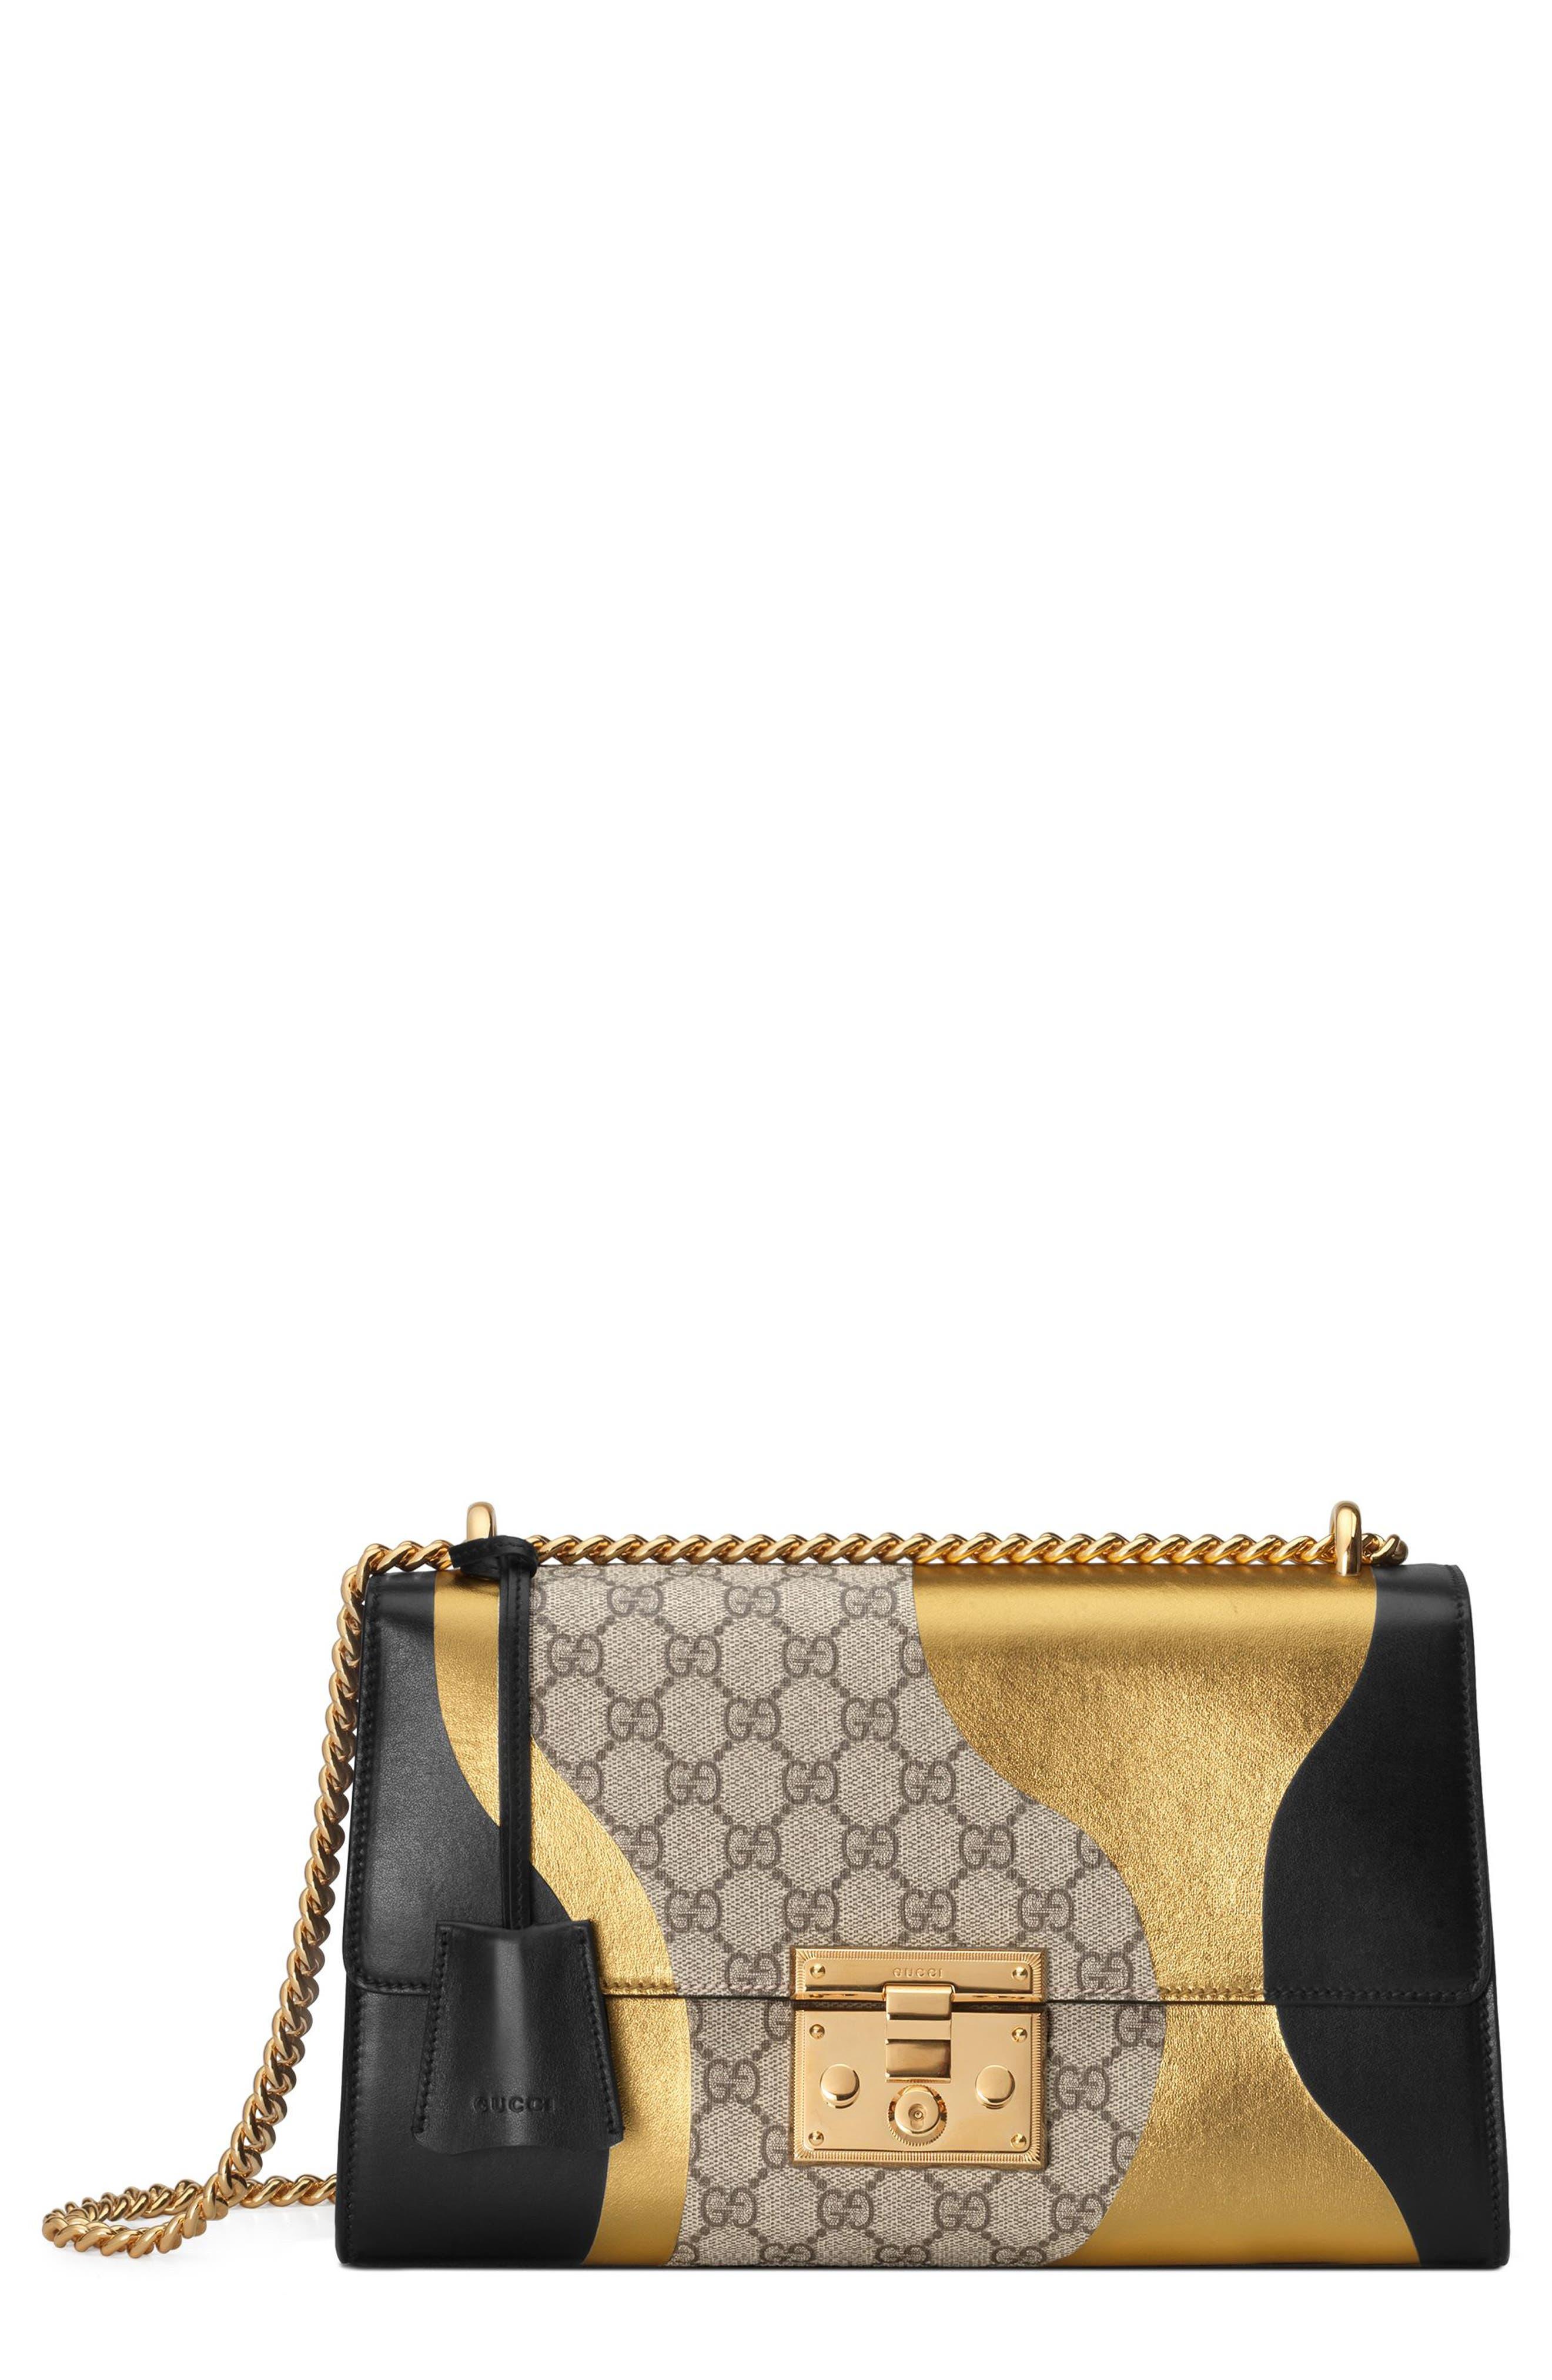 GUCCI Medium Padlock GG Supreme Canvas & Leather Shoulder Bag